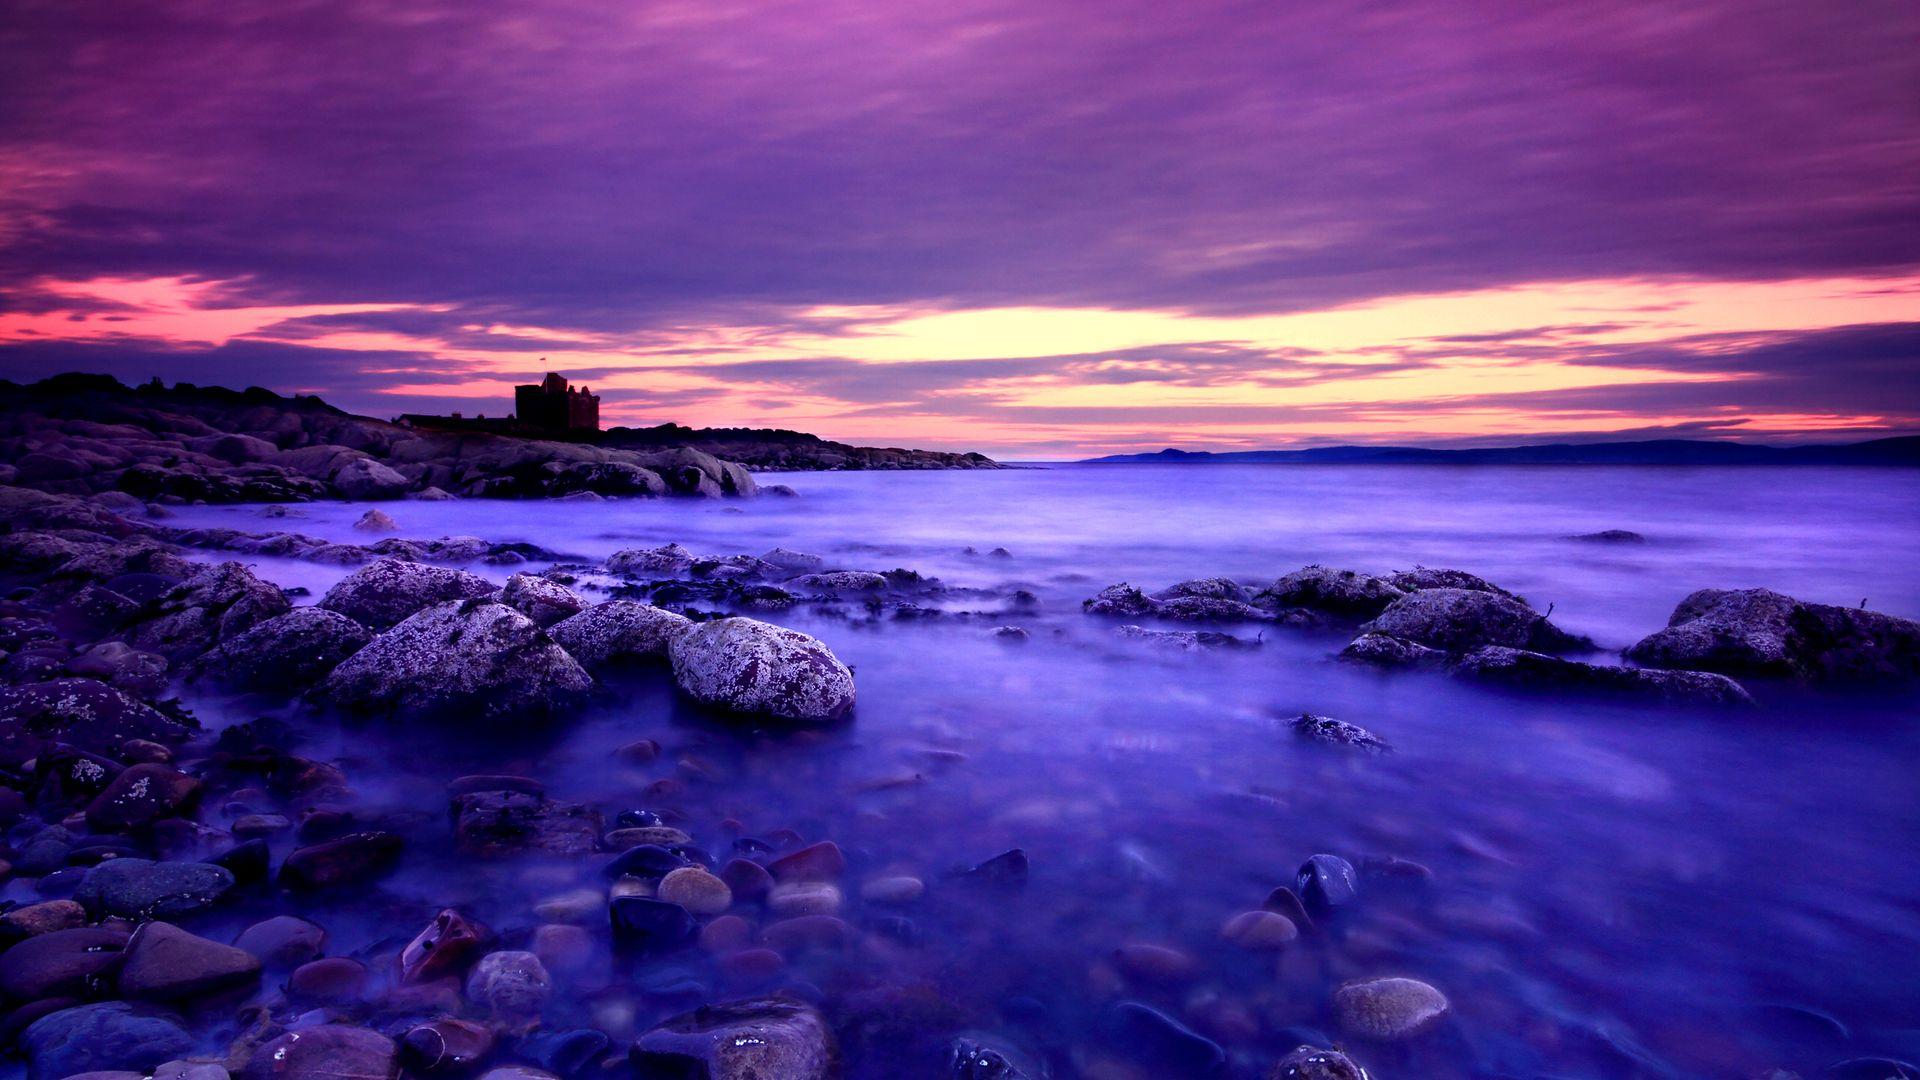 Wallpaper Desktop Purple Sunset